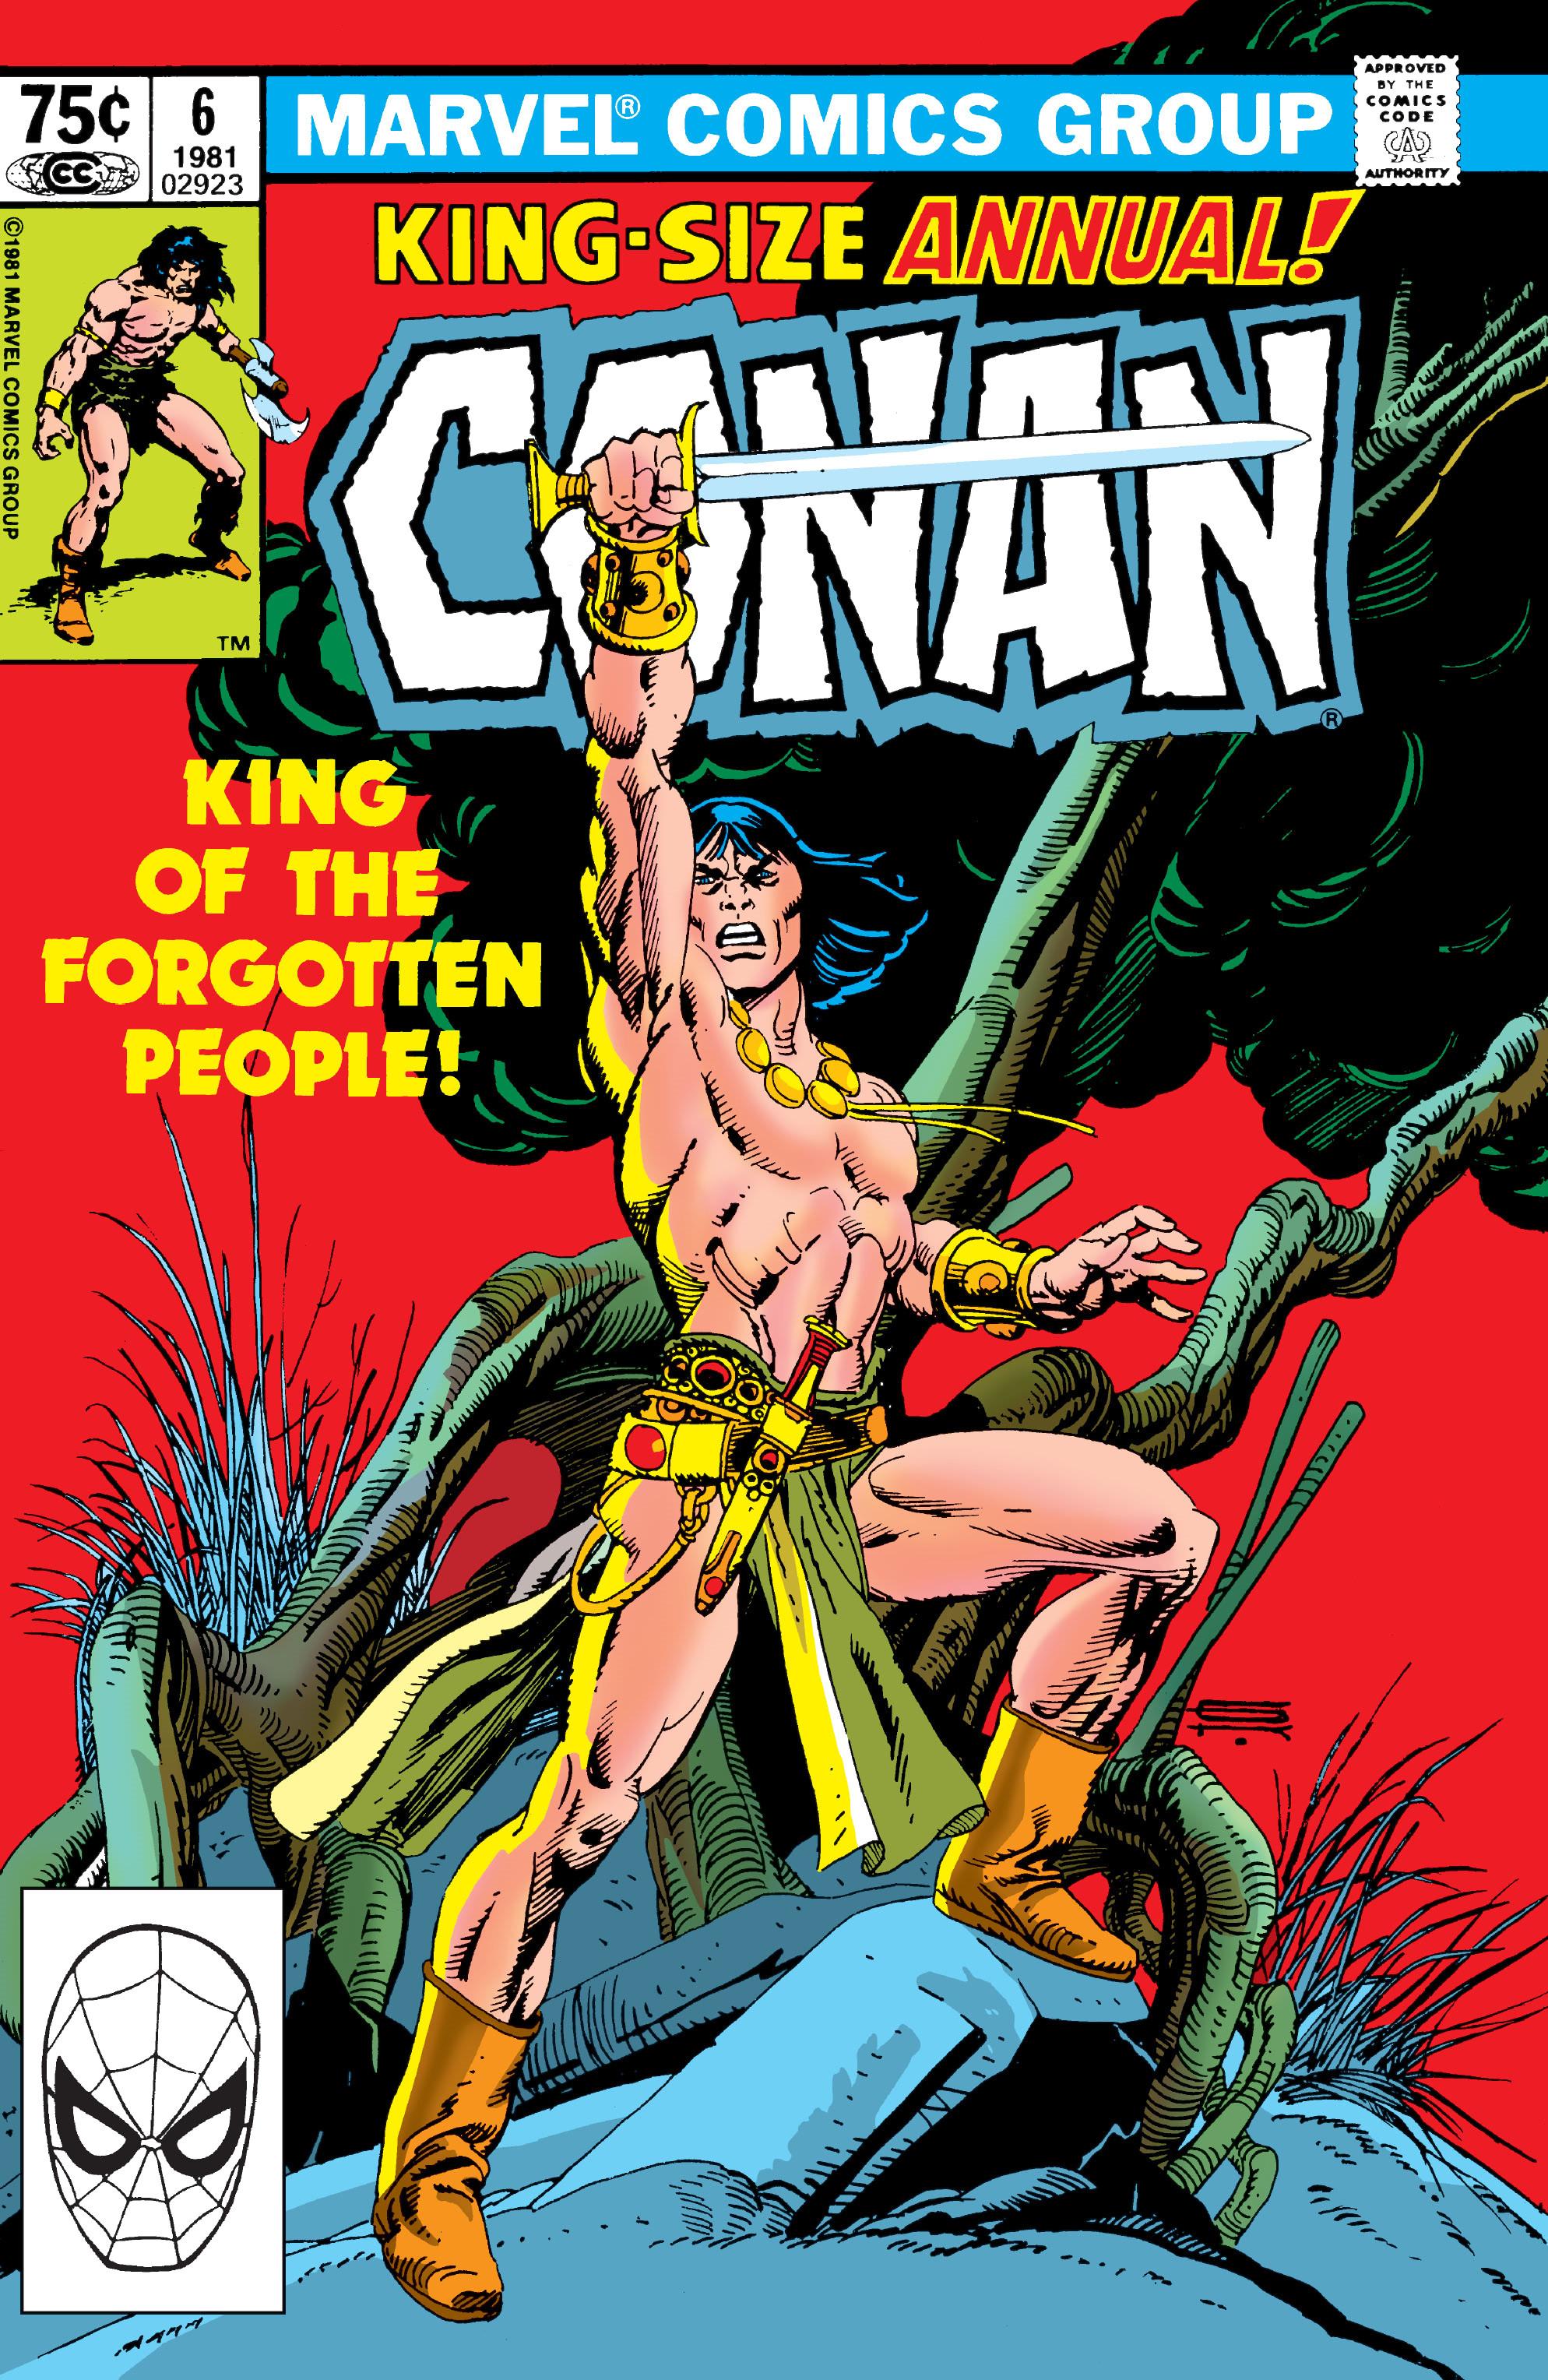 Conan the Barbarian Annual Vol 1 6